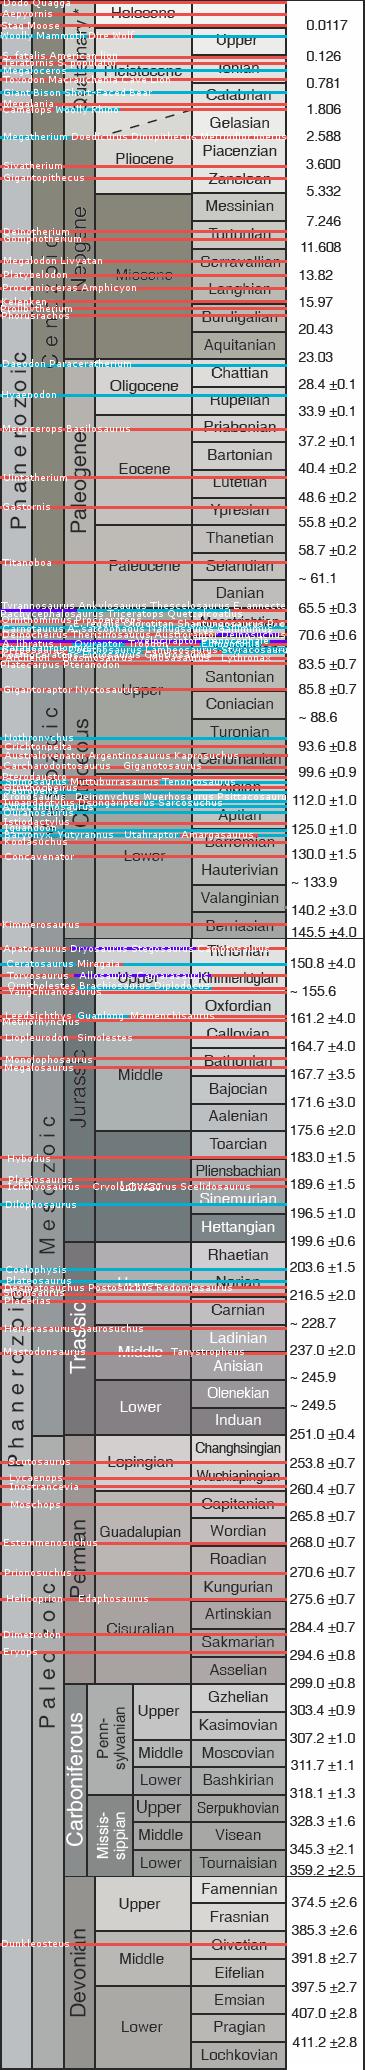 Prehistoric Kingdom Timeline by Flishstar